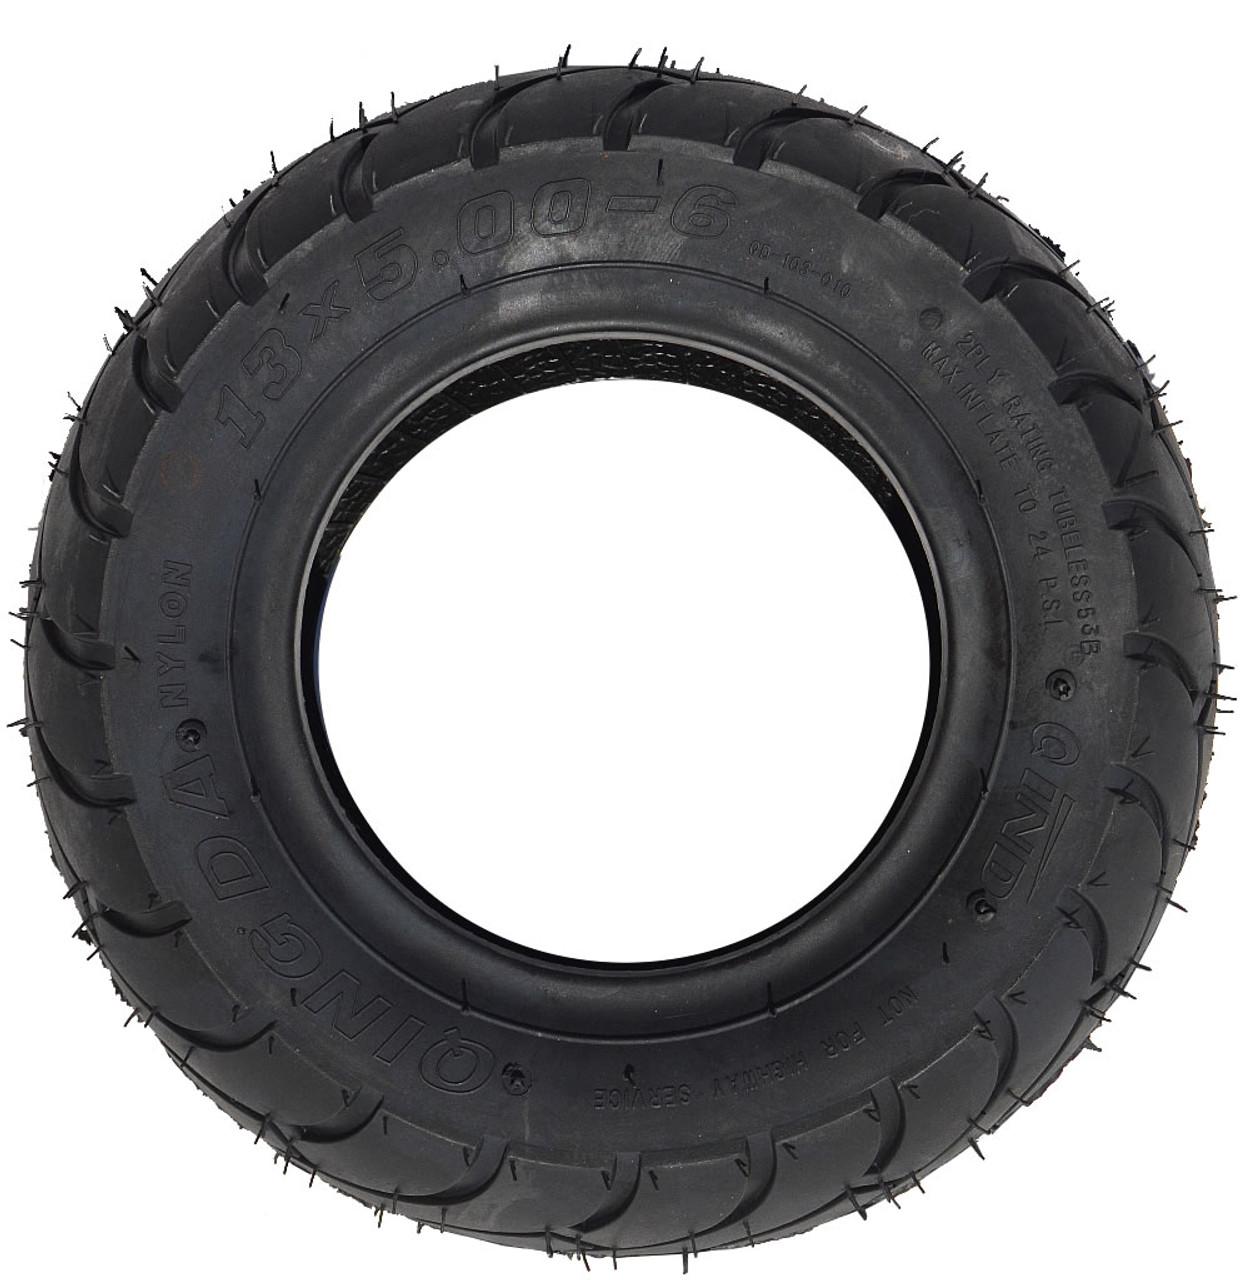 13x5-6 Street Tire - Please Read Description